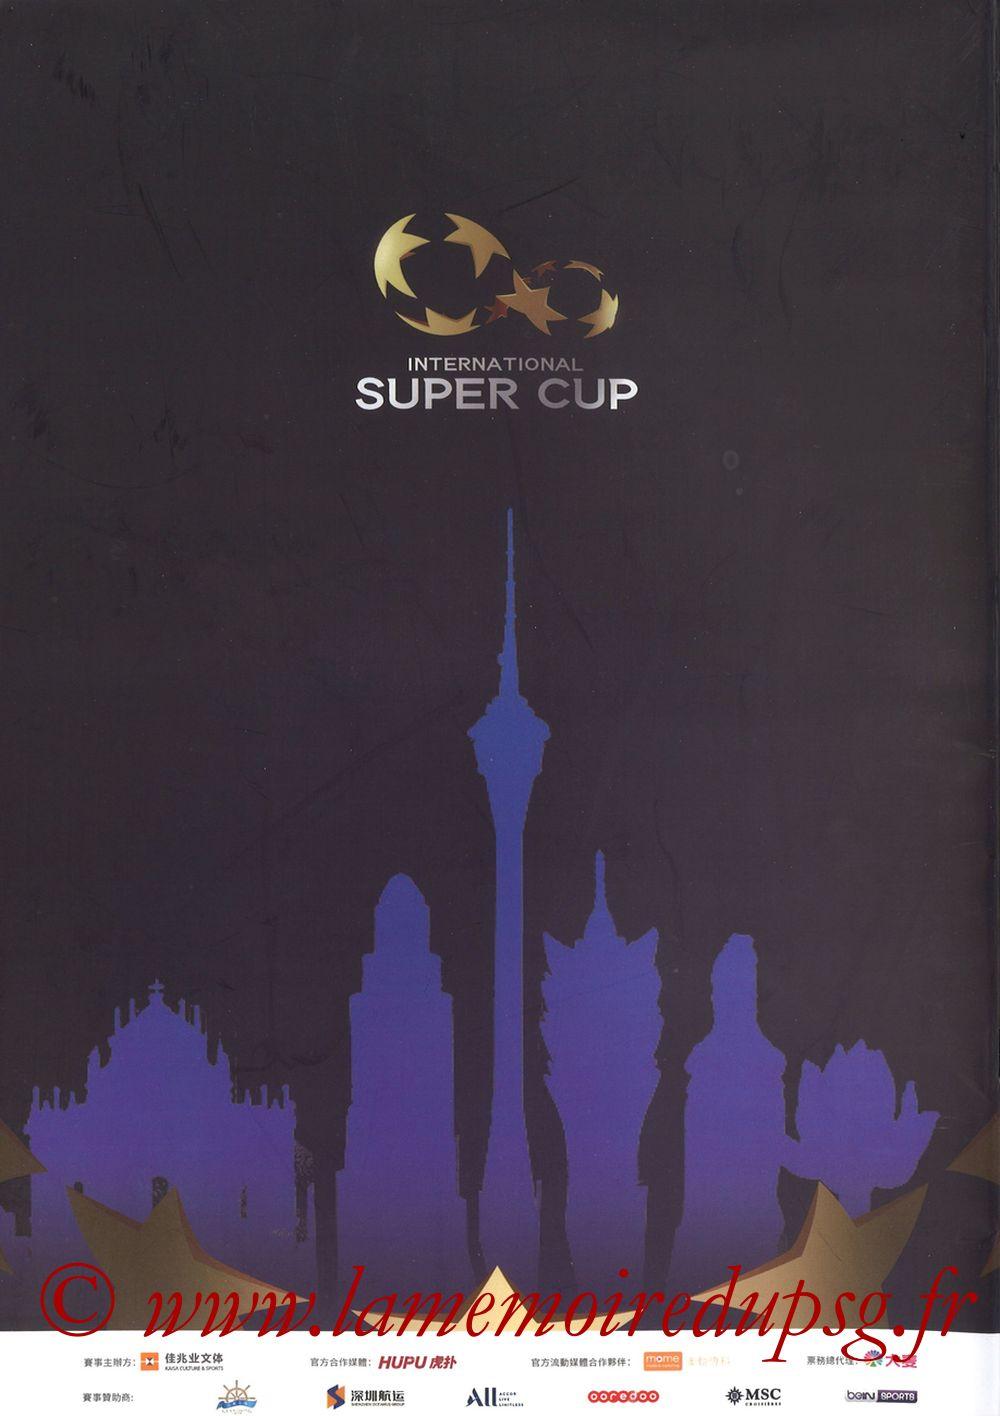 2019-07-27  PSG-Inter (International Super Cup à Macau, Dossier de presse) - Page 13